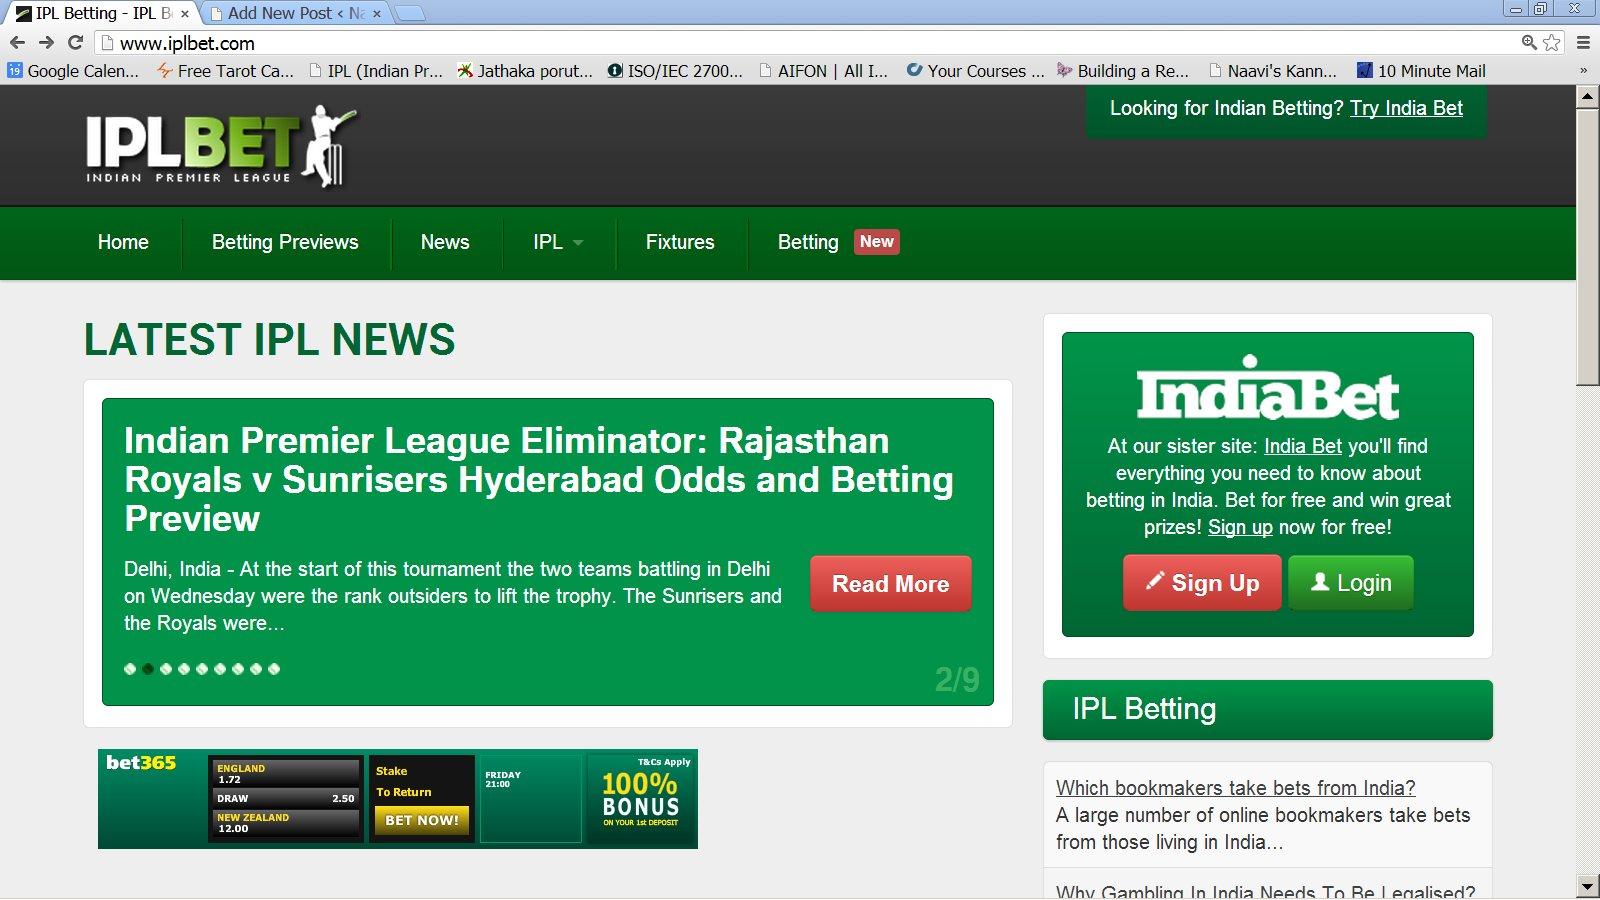 Online betting in ipl 7 schedule betting odds api